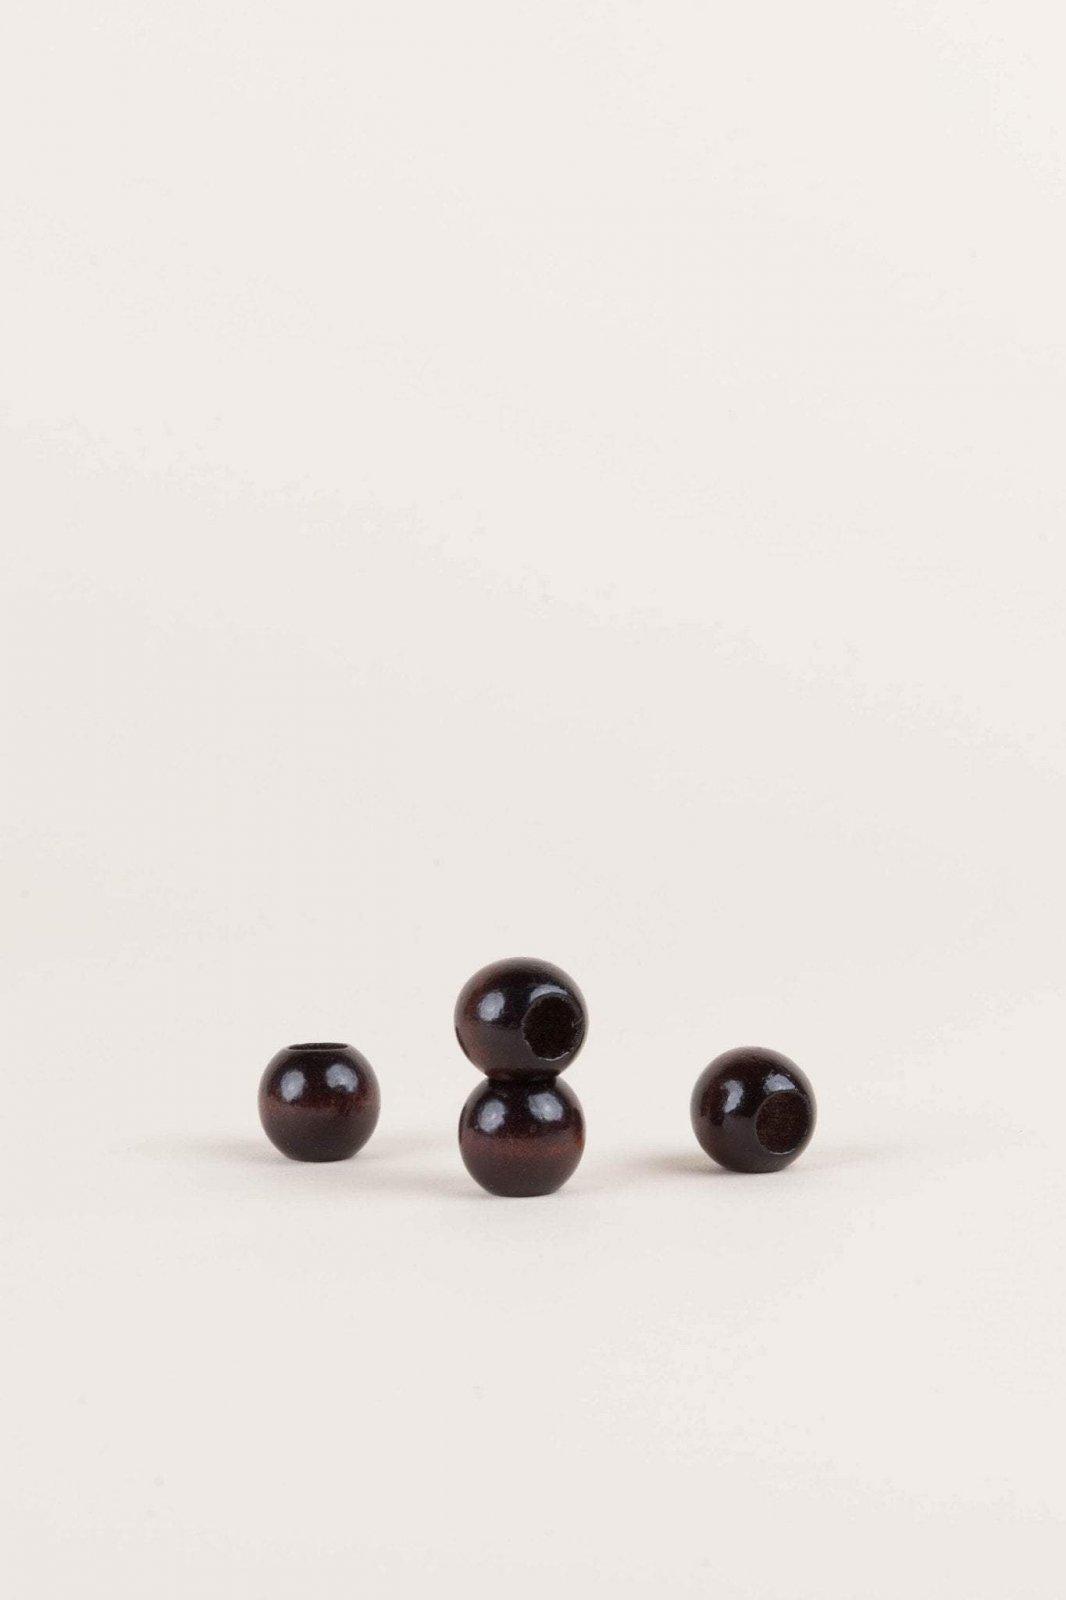 Wood Macrame Beads